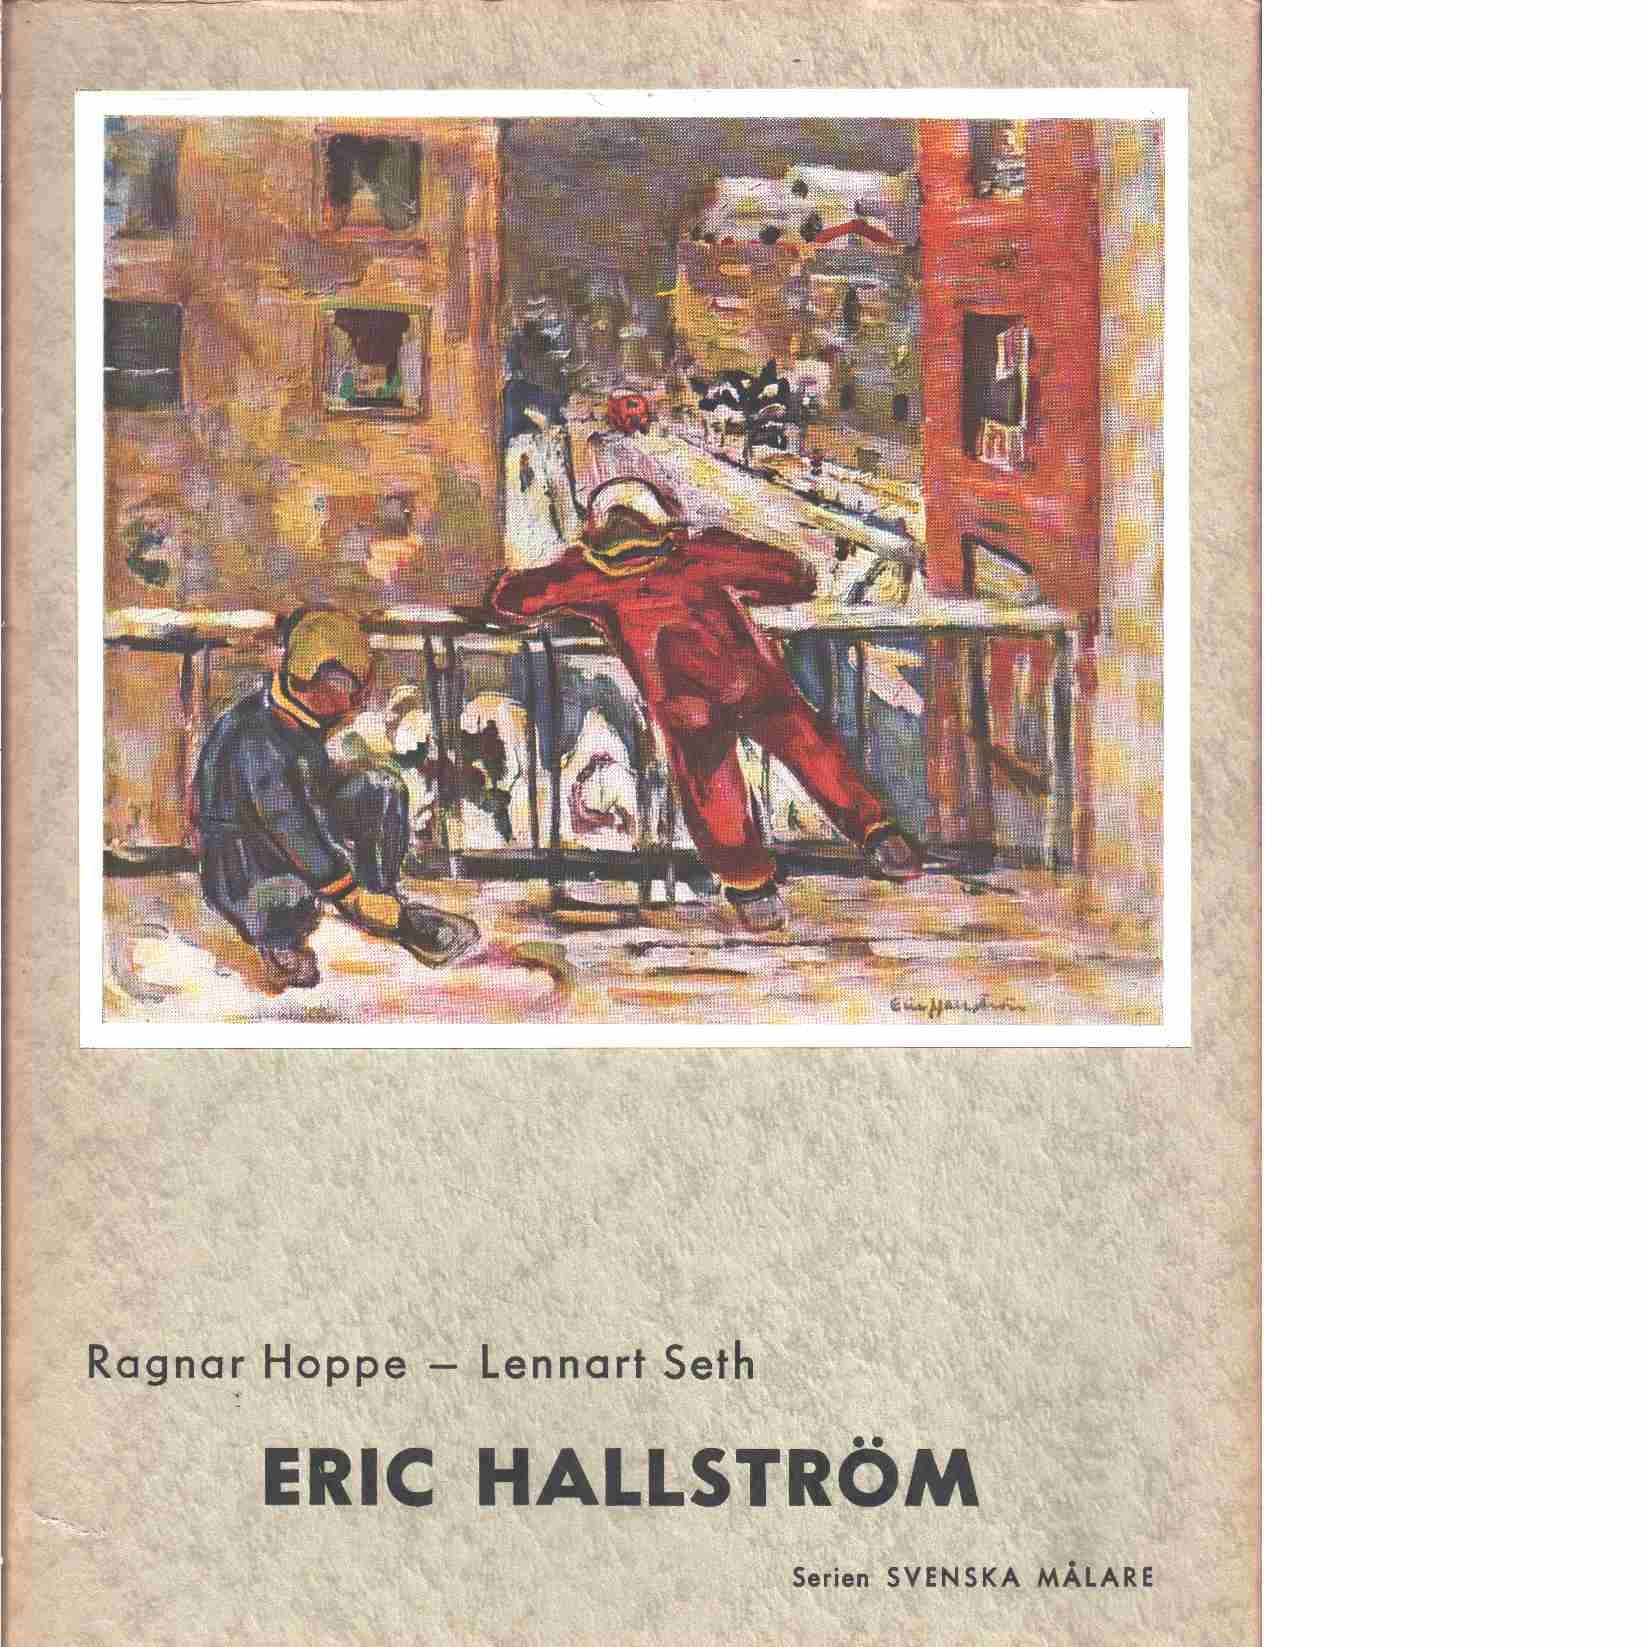 Eric Hallström - Hoppe, Ragnar och Seth, Lennart